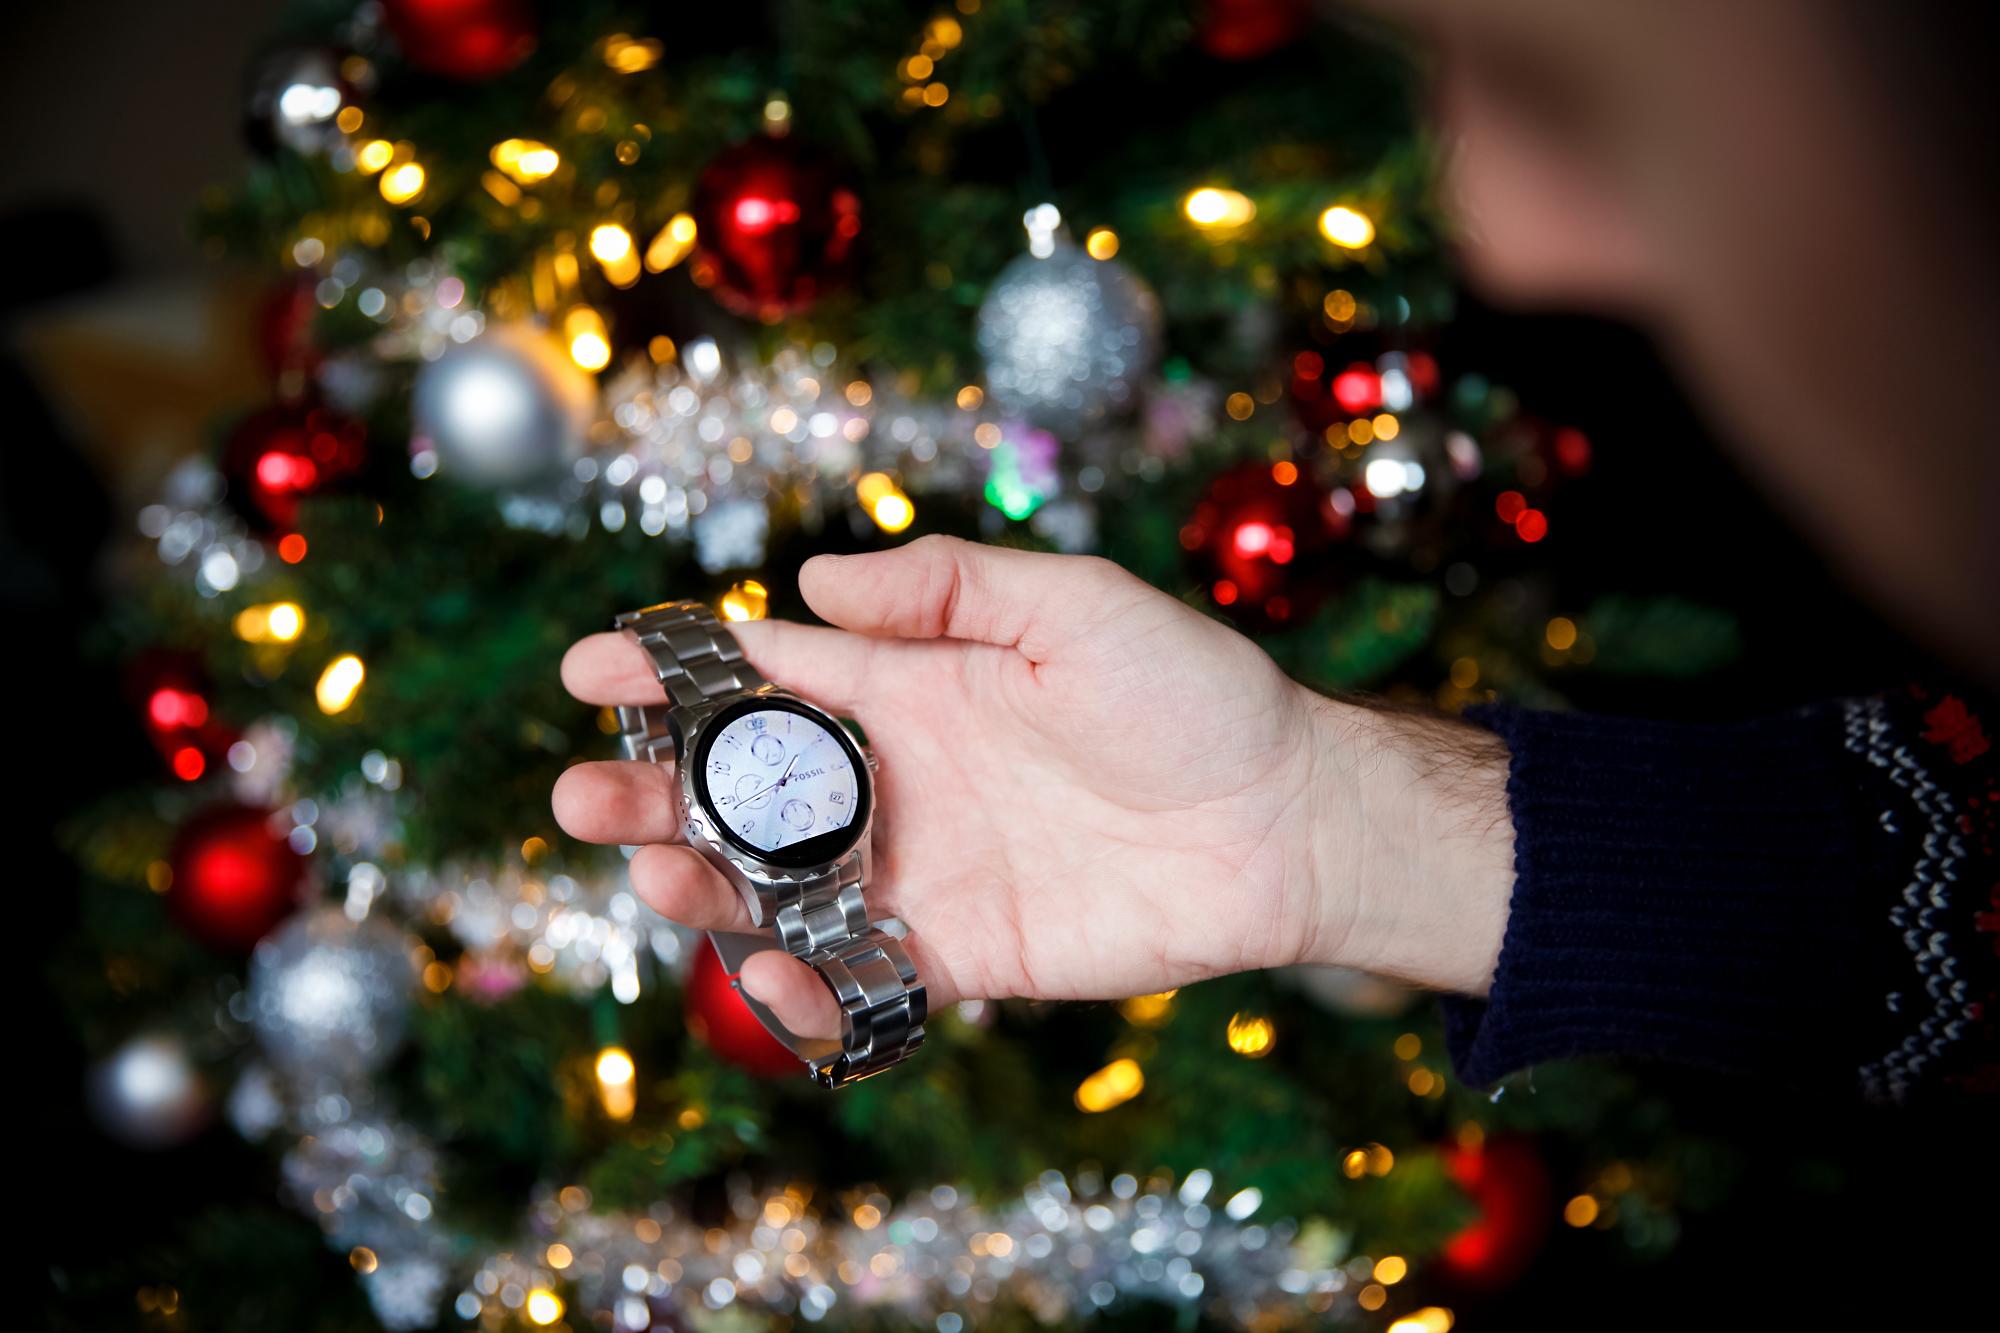 Fossil q marshal holiday gifting